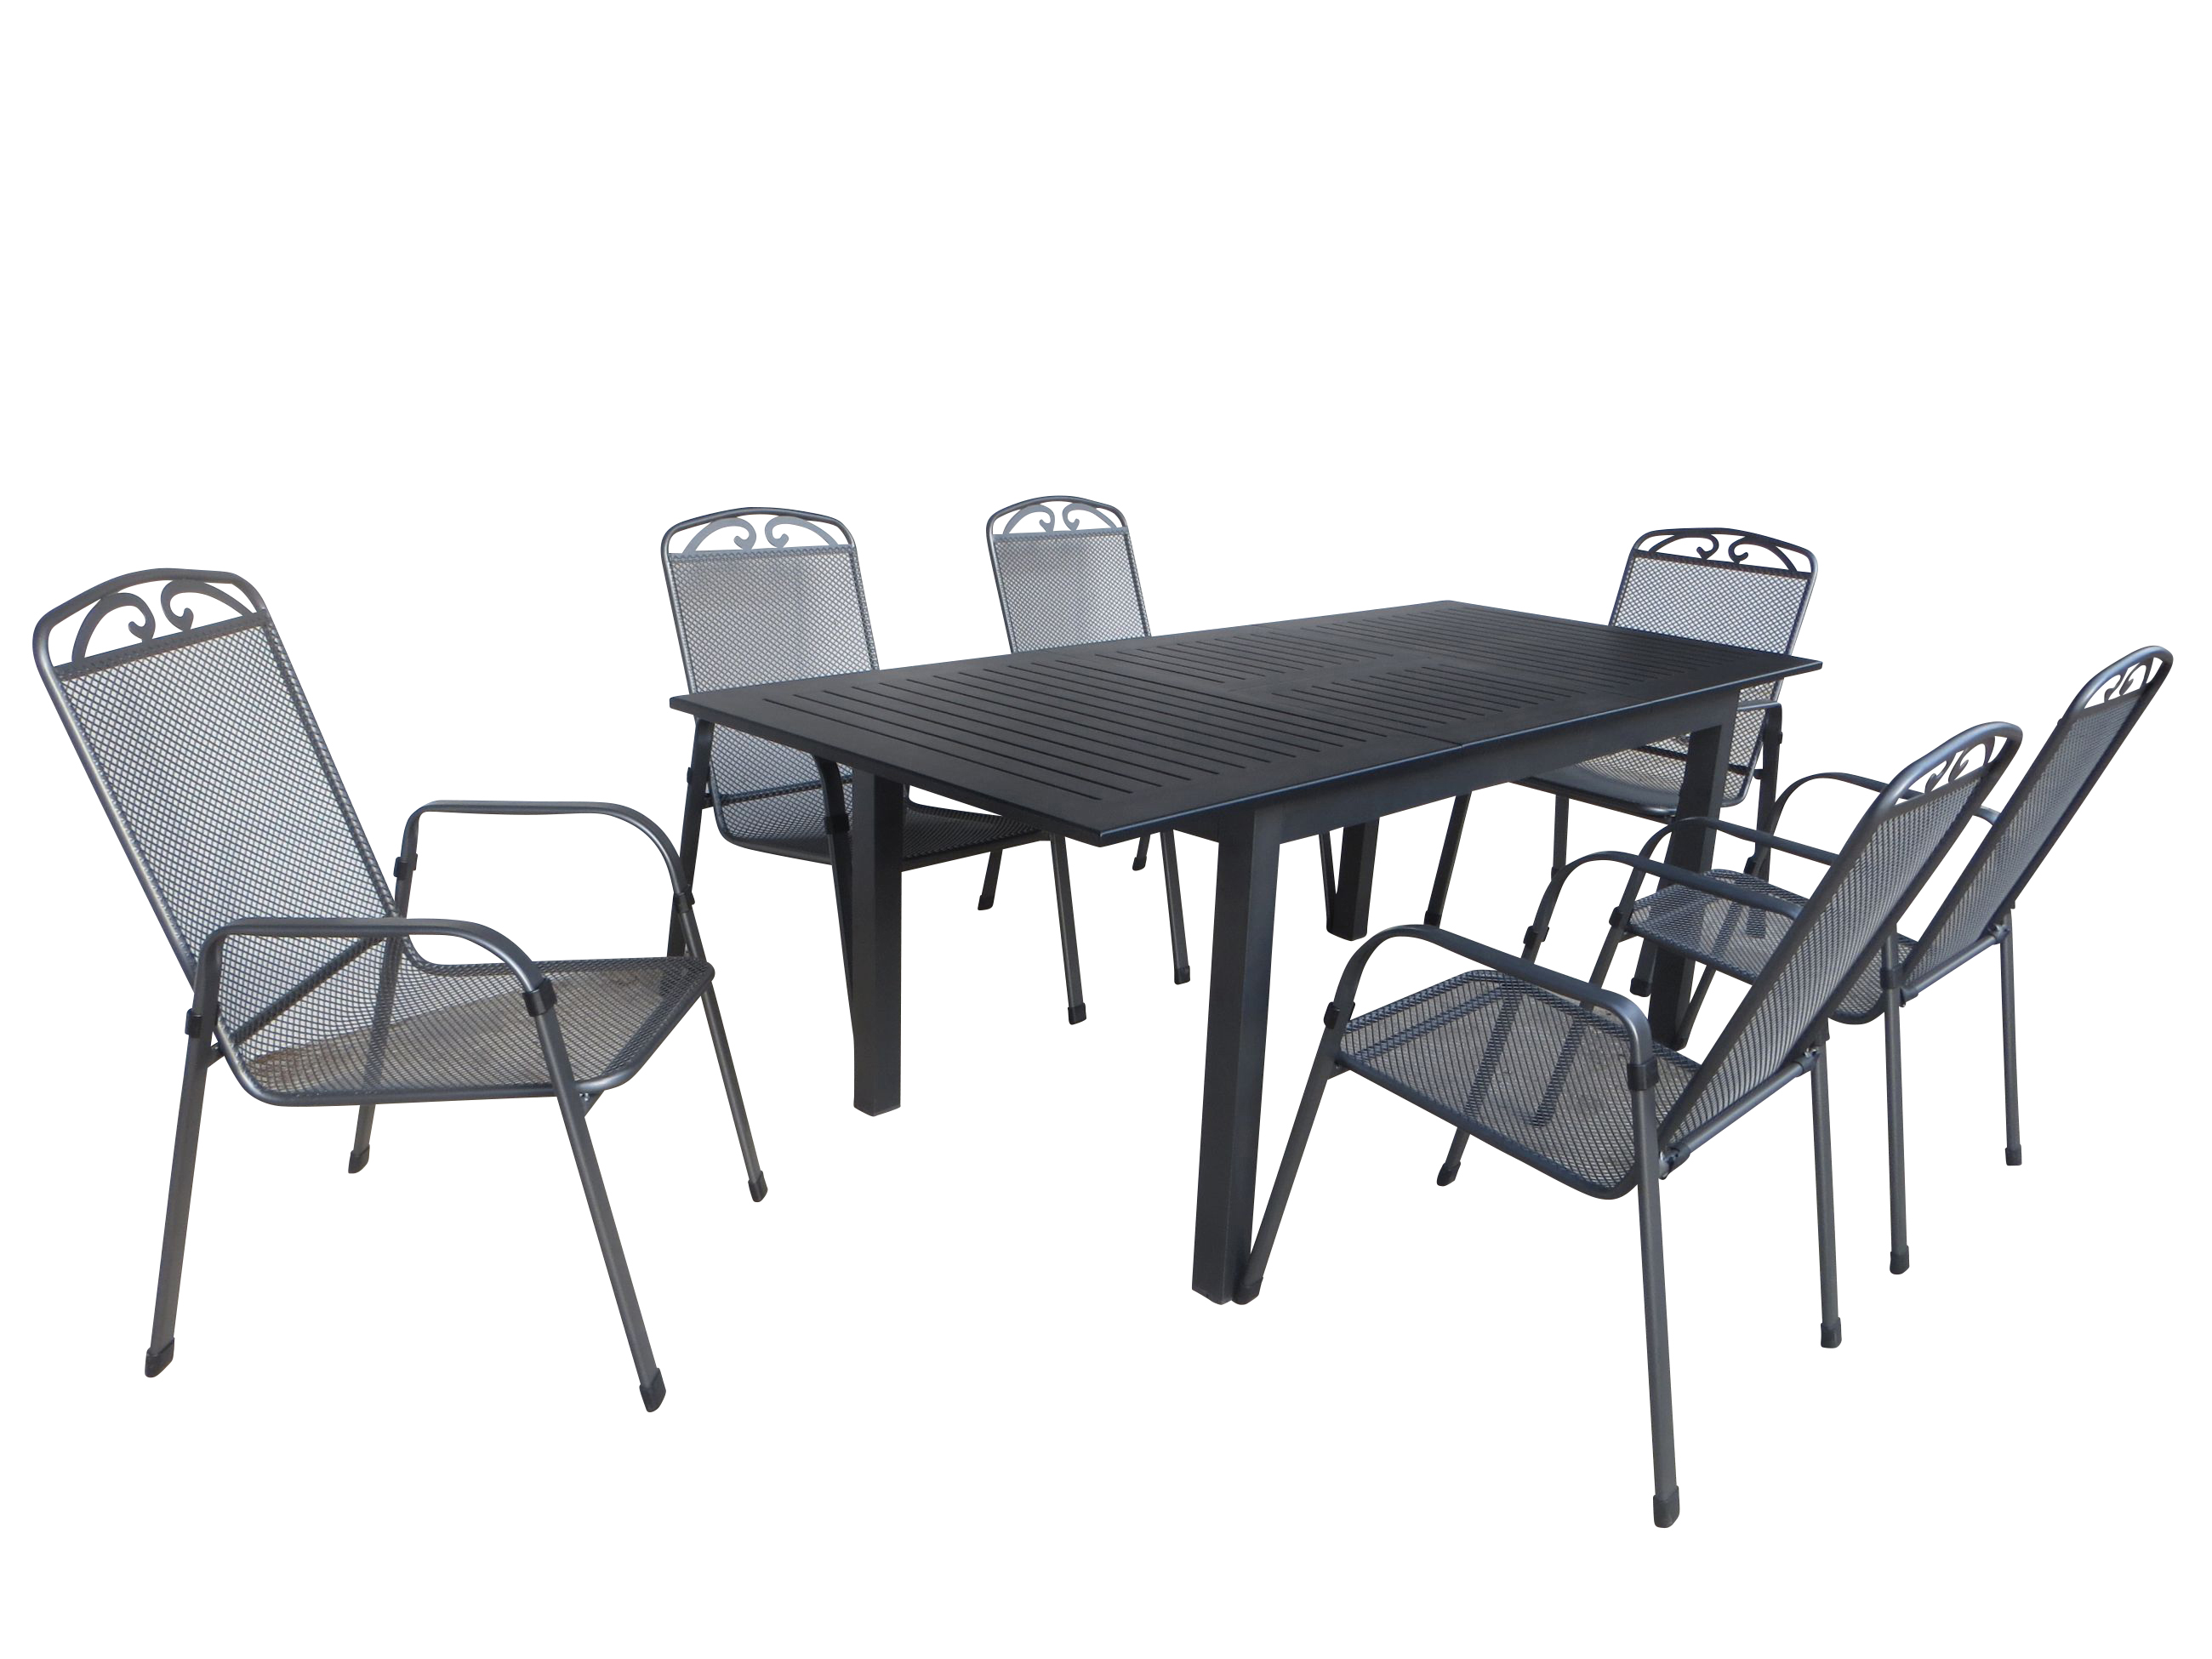 kuta alu gartenm bel set sitzgarnitur 7 tlg anthrazit schwarz gartenm bel gruppen garten. Black Bedroom Furniture Sets. Home Design Ideas